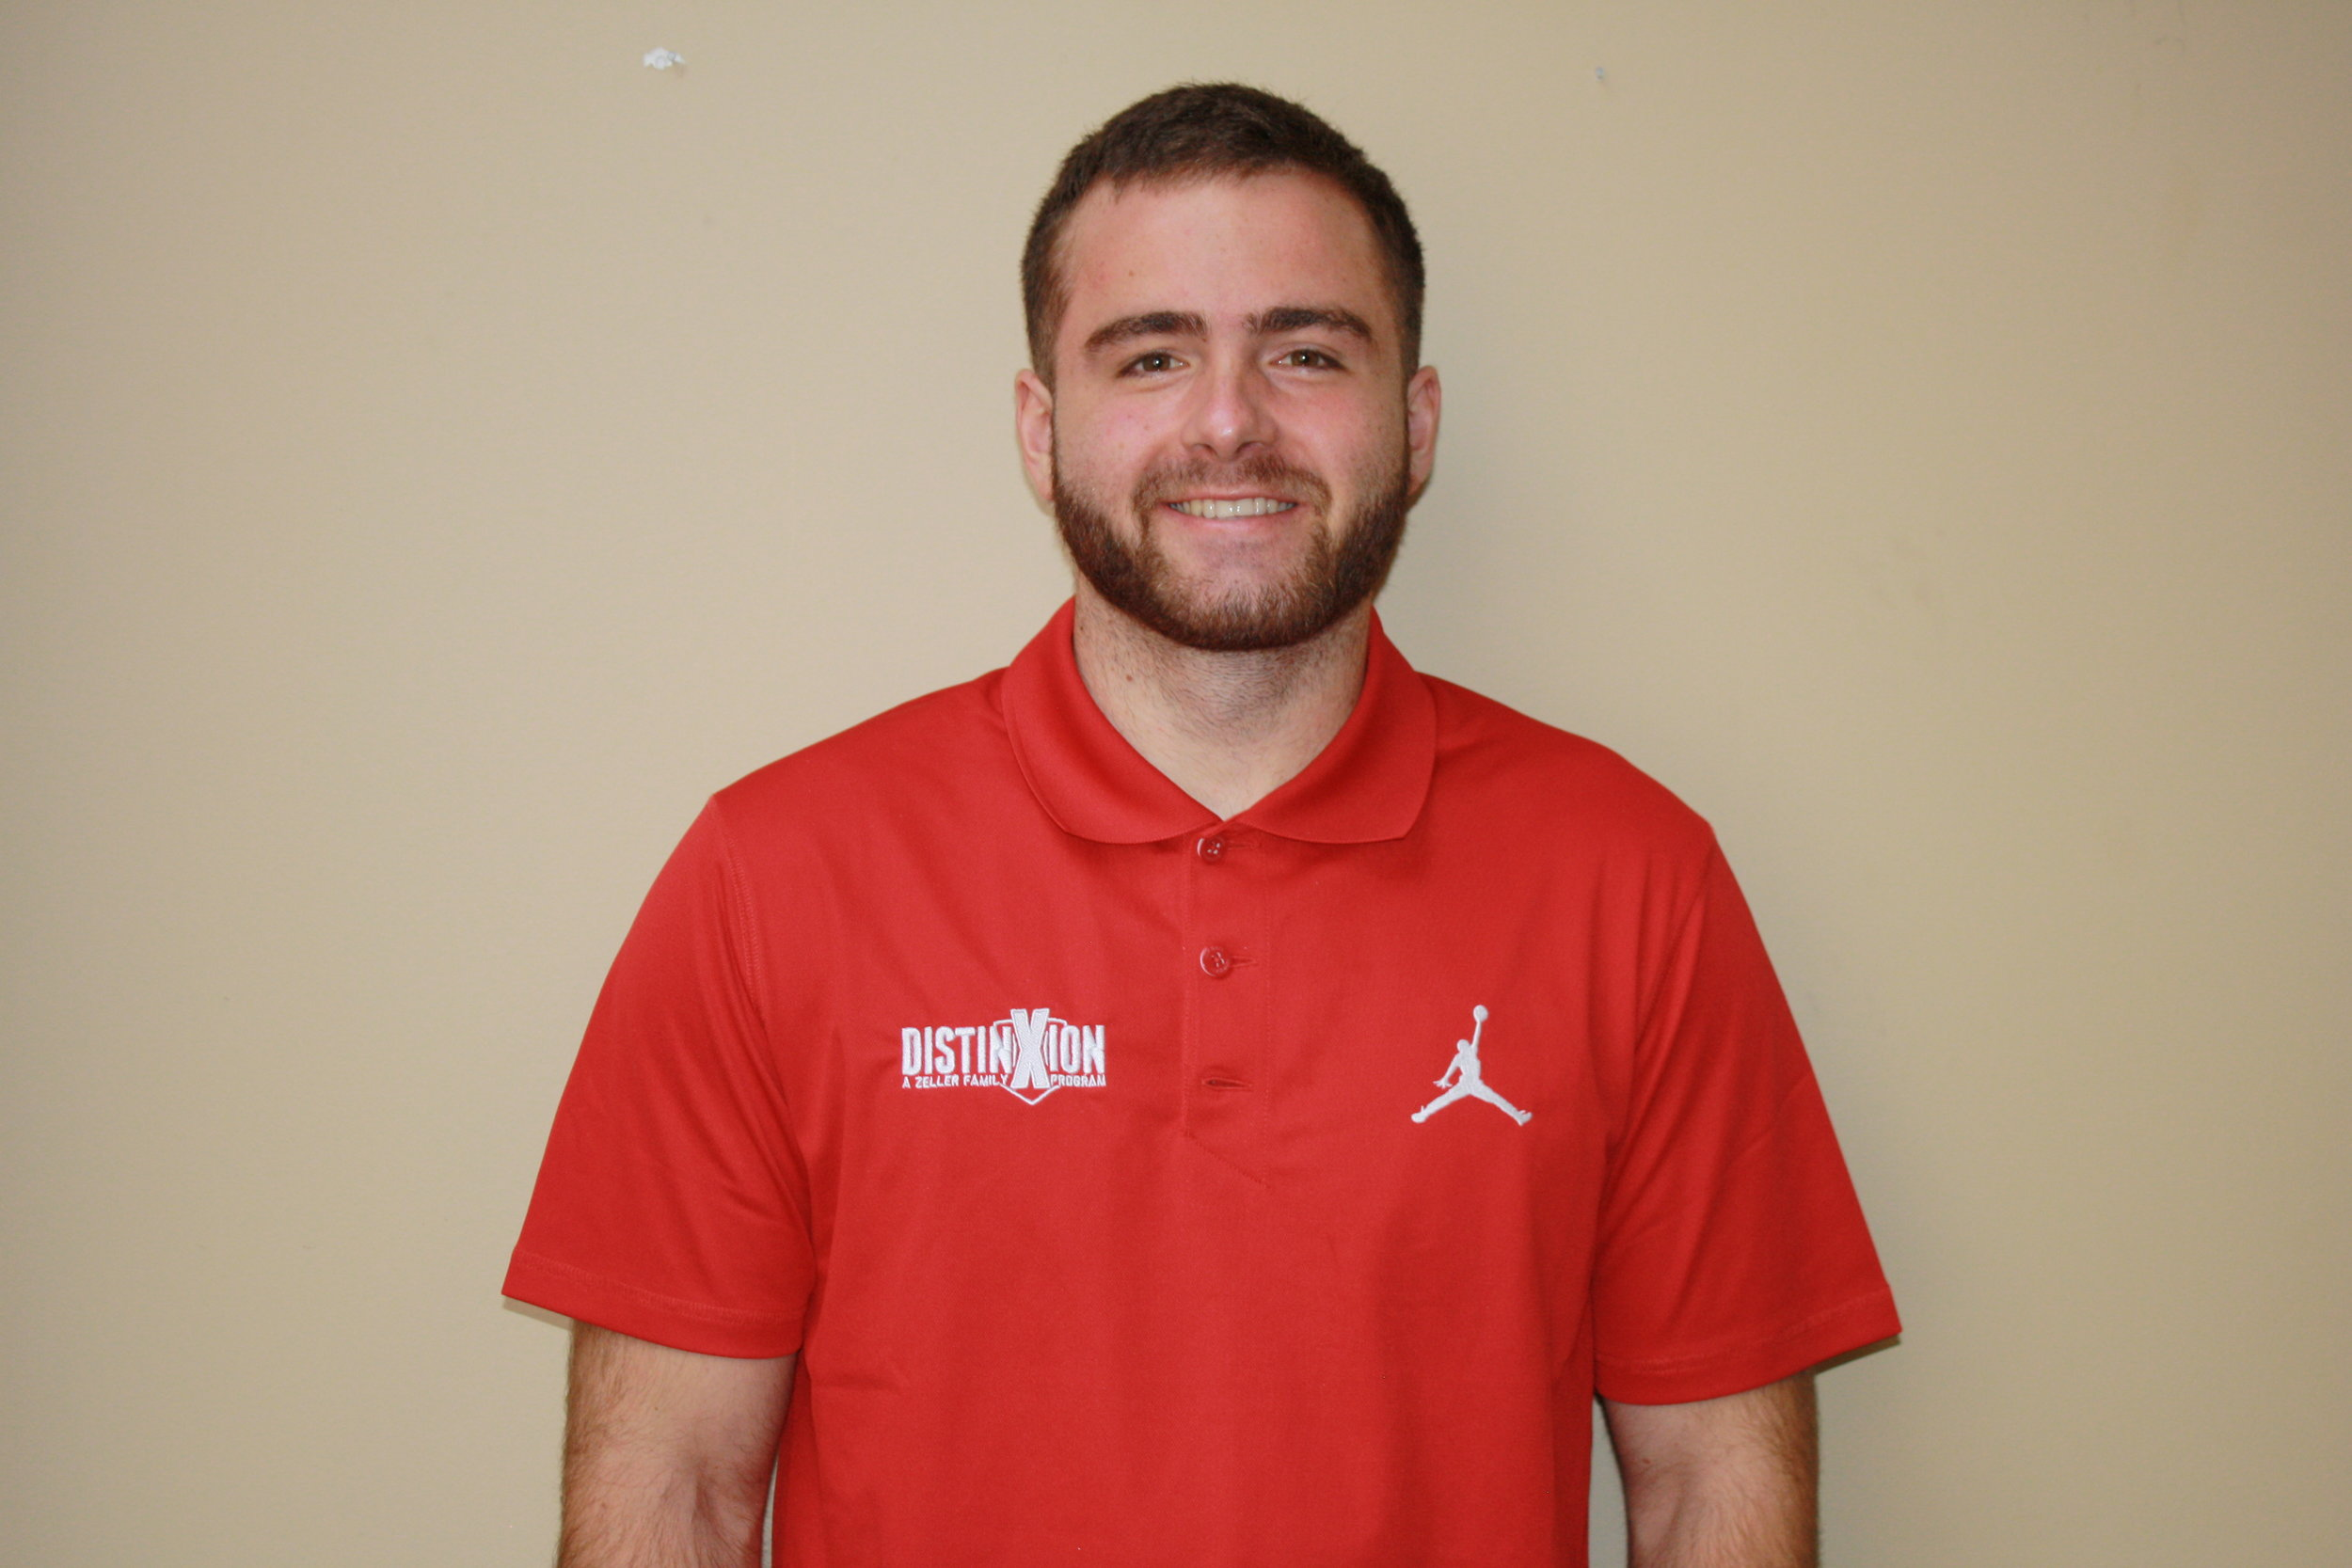 Dalton Judd    C.H.A.M.P.I.O.N.S. Program Director